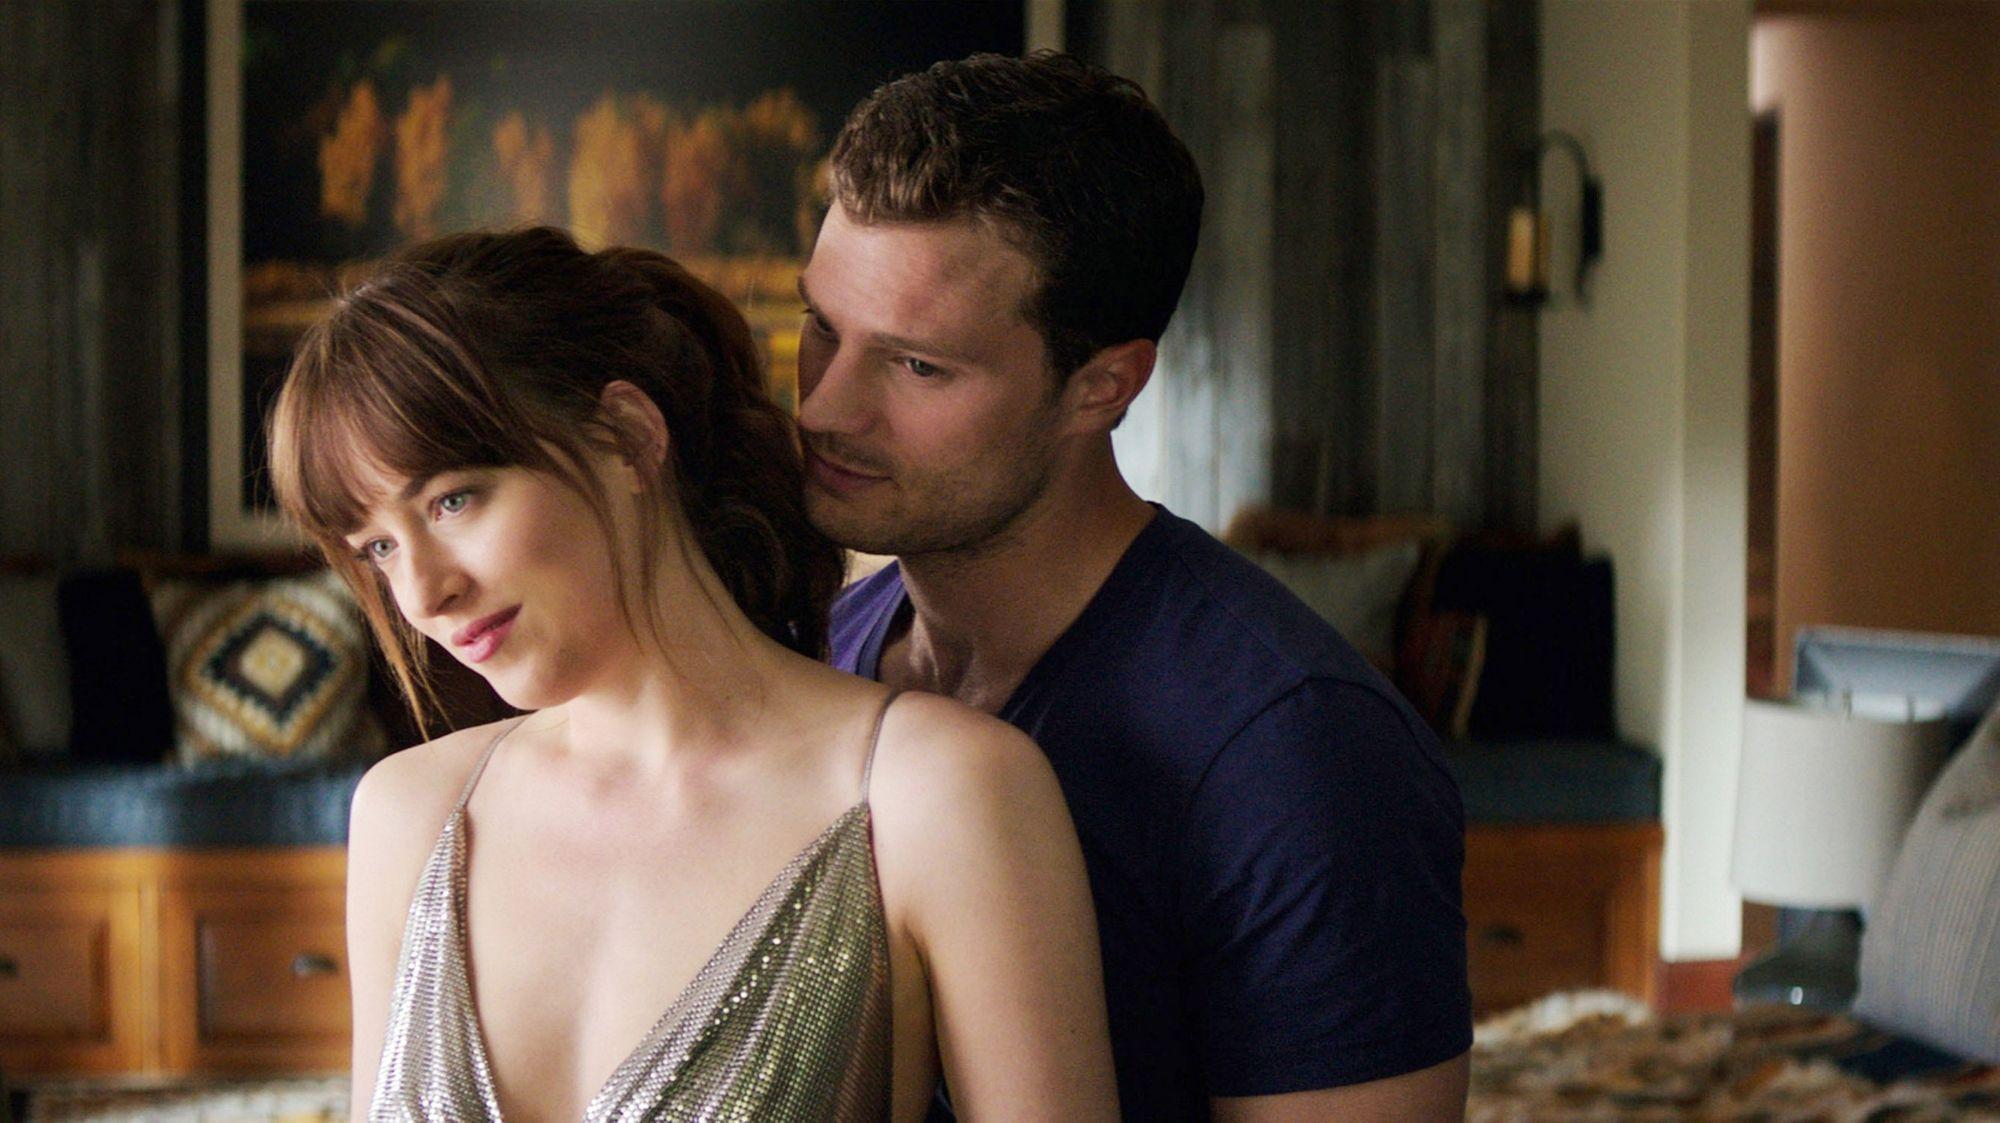 Watch Fifty Shades Darker Streaming on Netflix Canada - Best VPNs